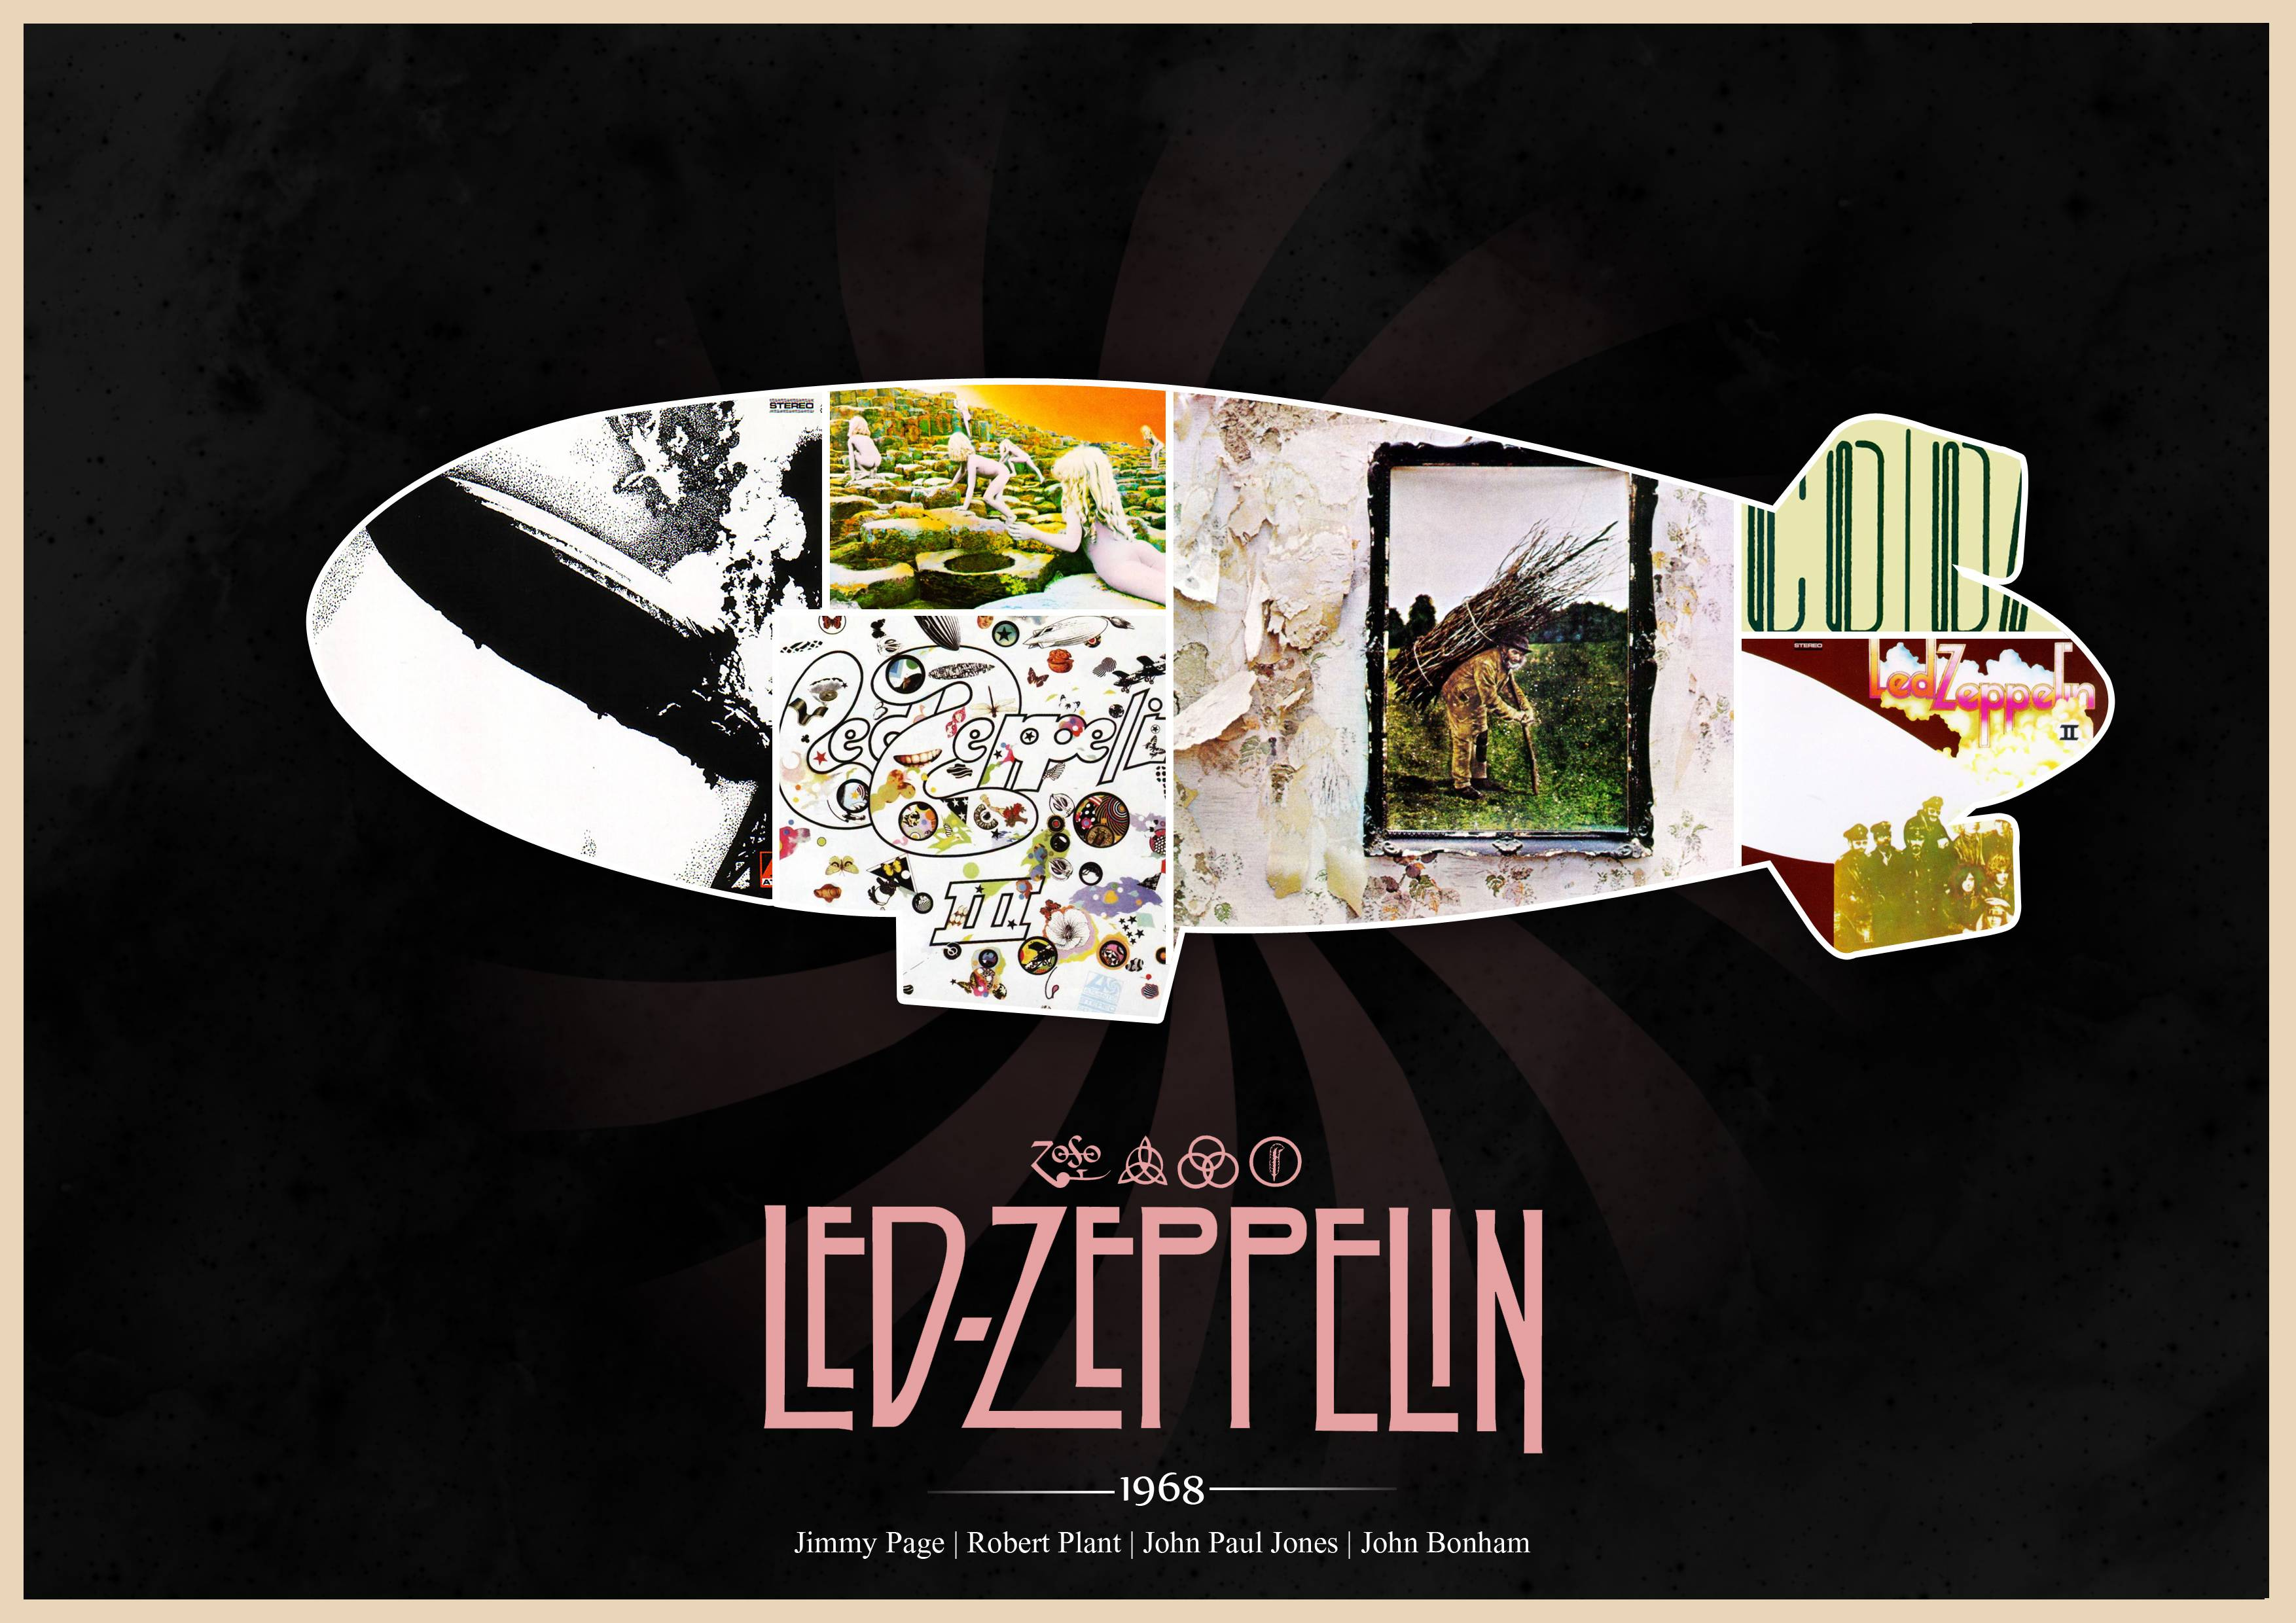 Led Zeppelin Wallpapers - Wallpaper Cave